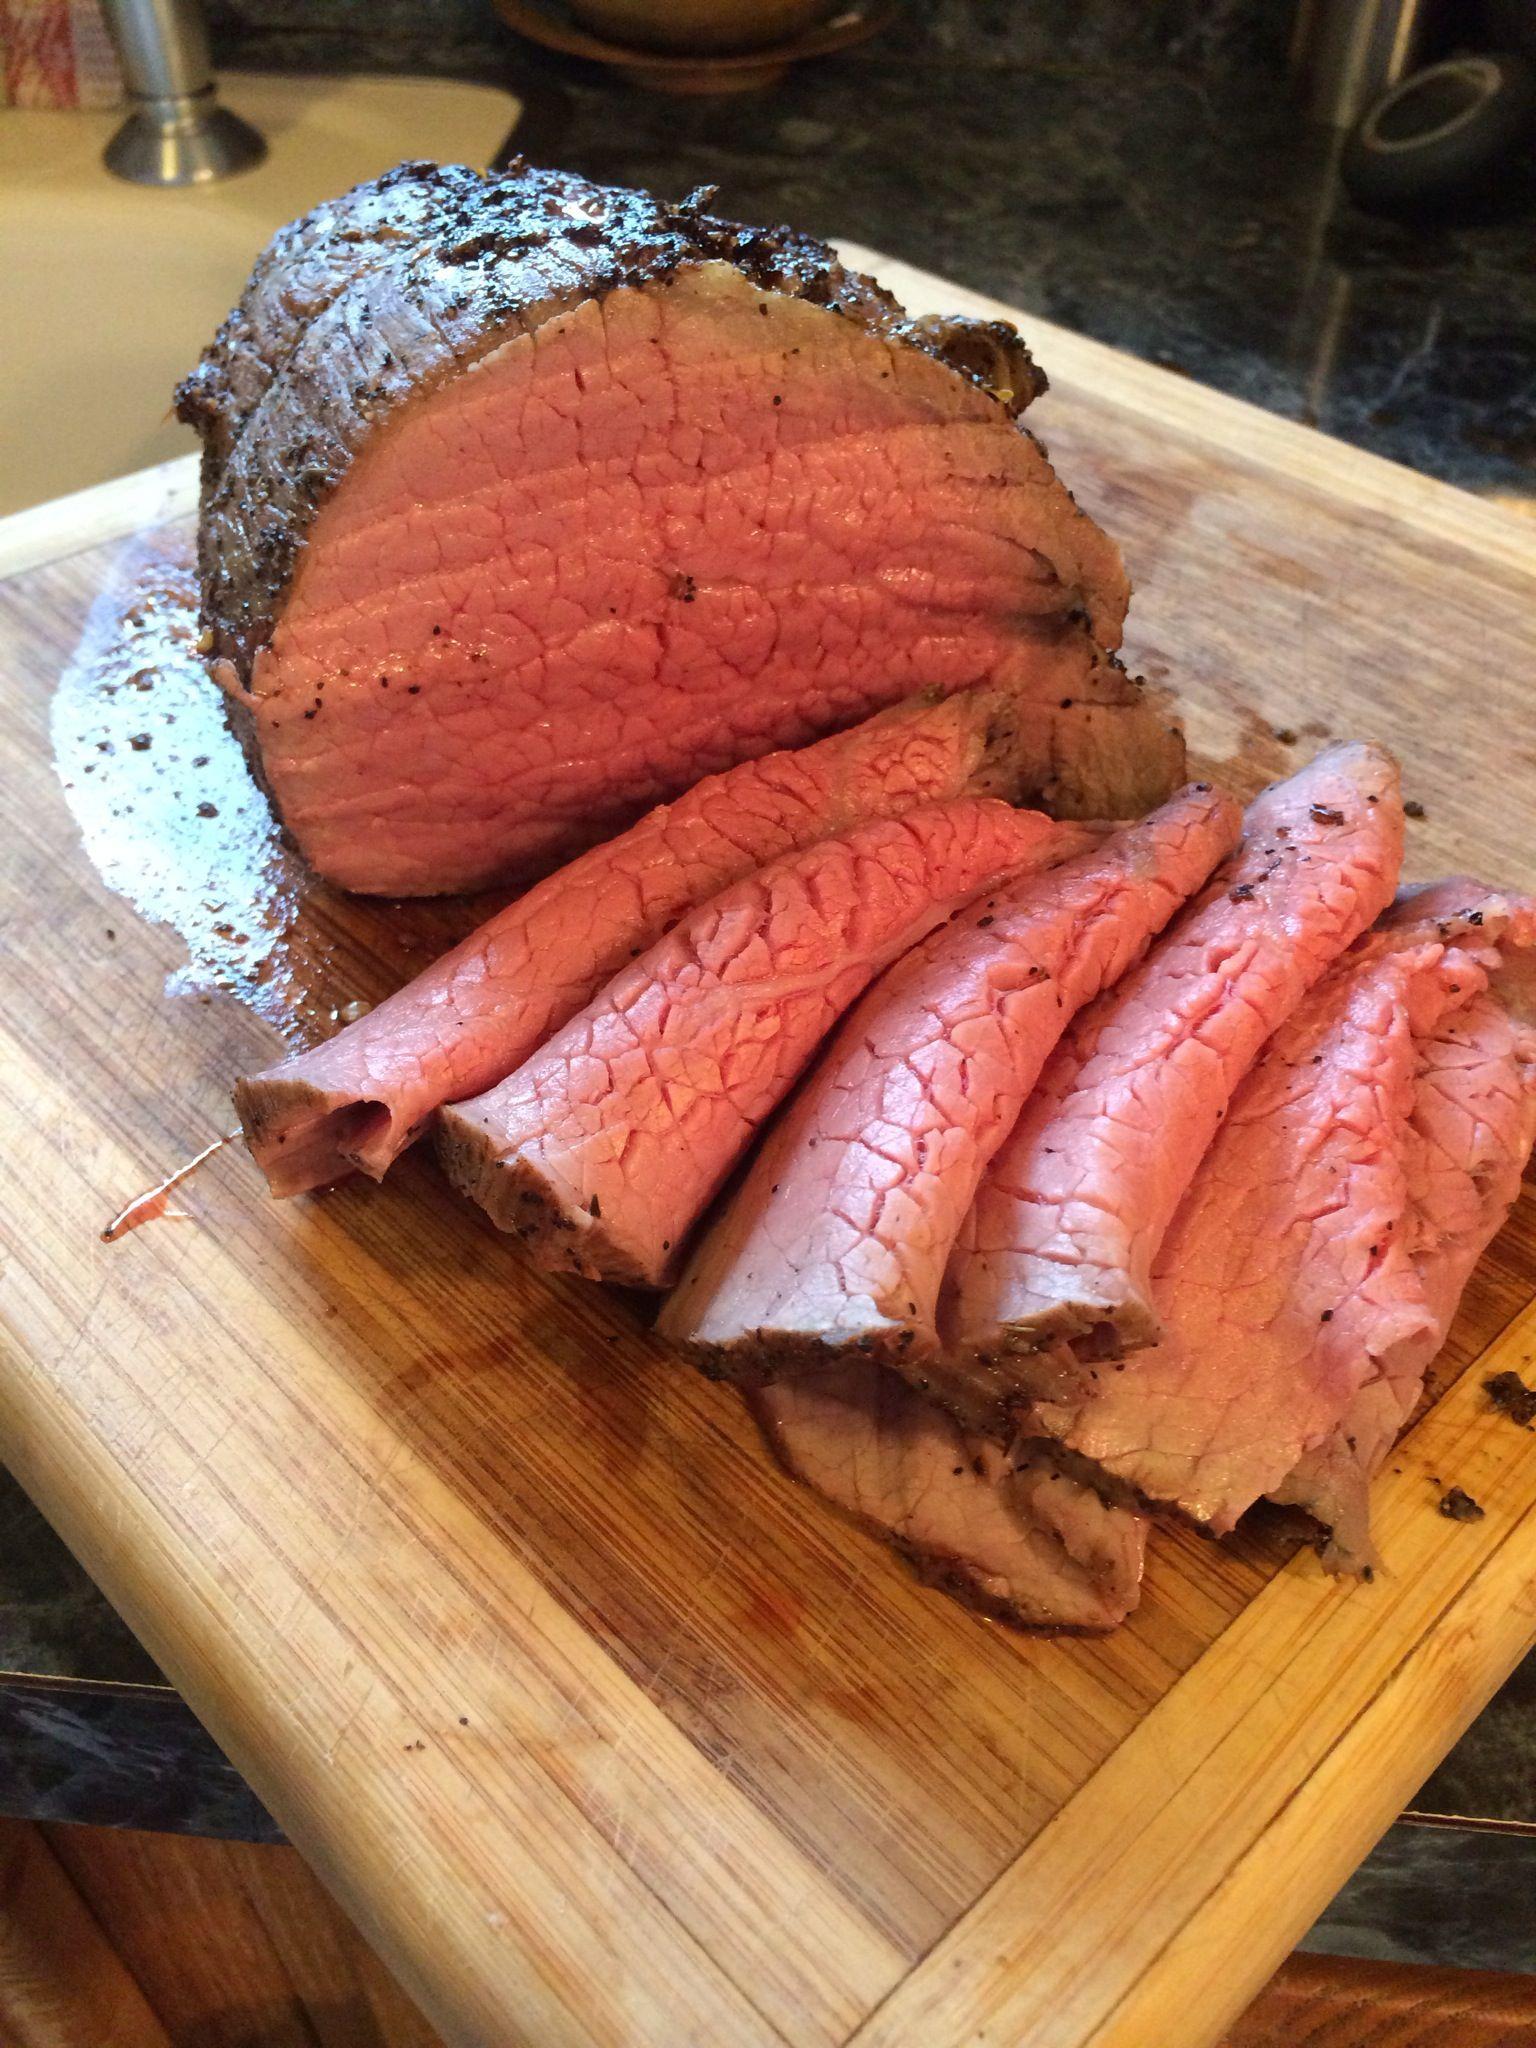 Cook A Tender Eye Round Roast Recipe Roast Beef Recipes Recipes Beef Recipes